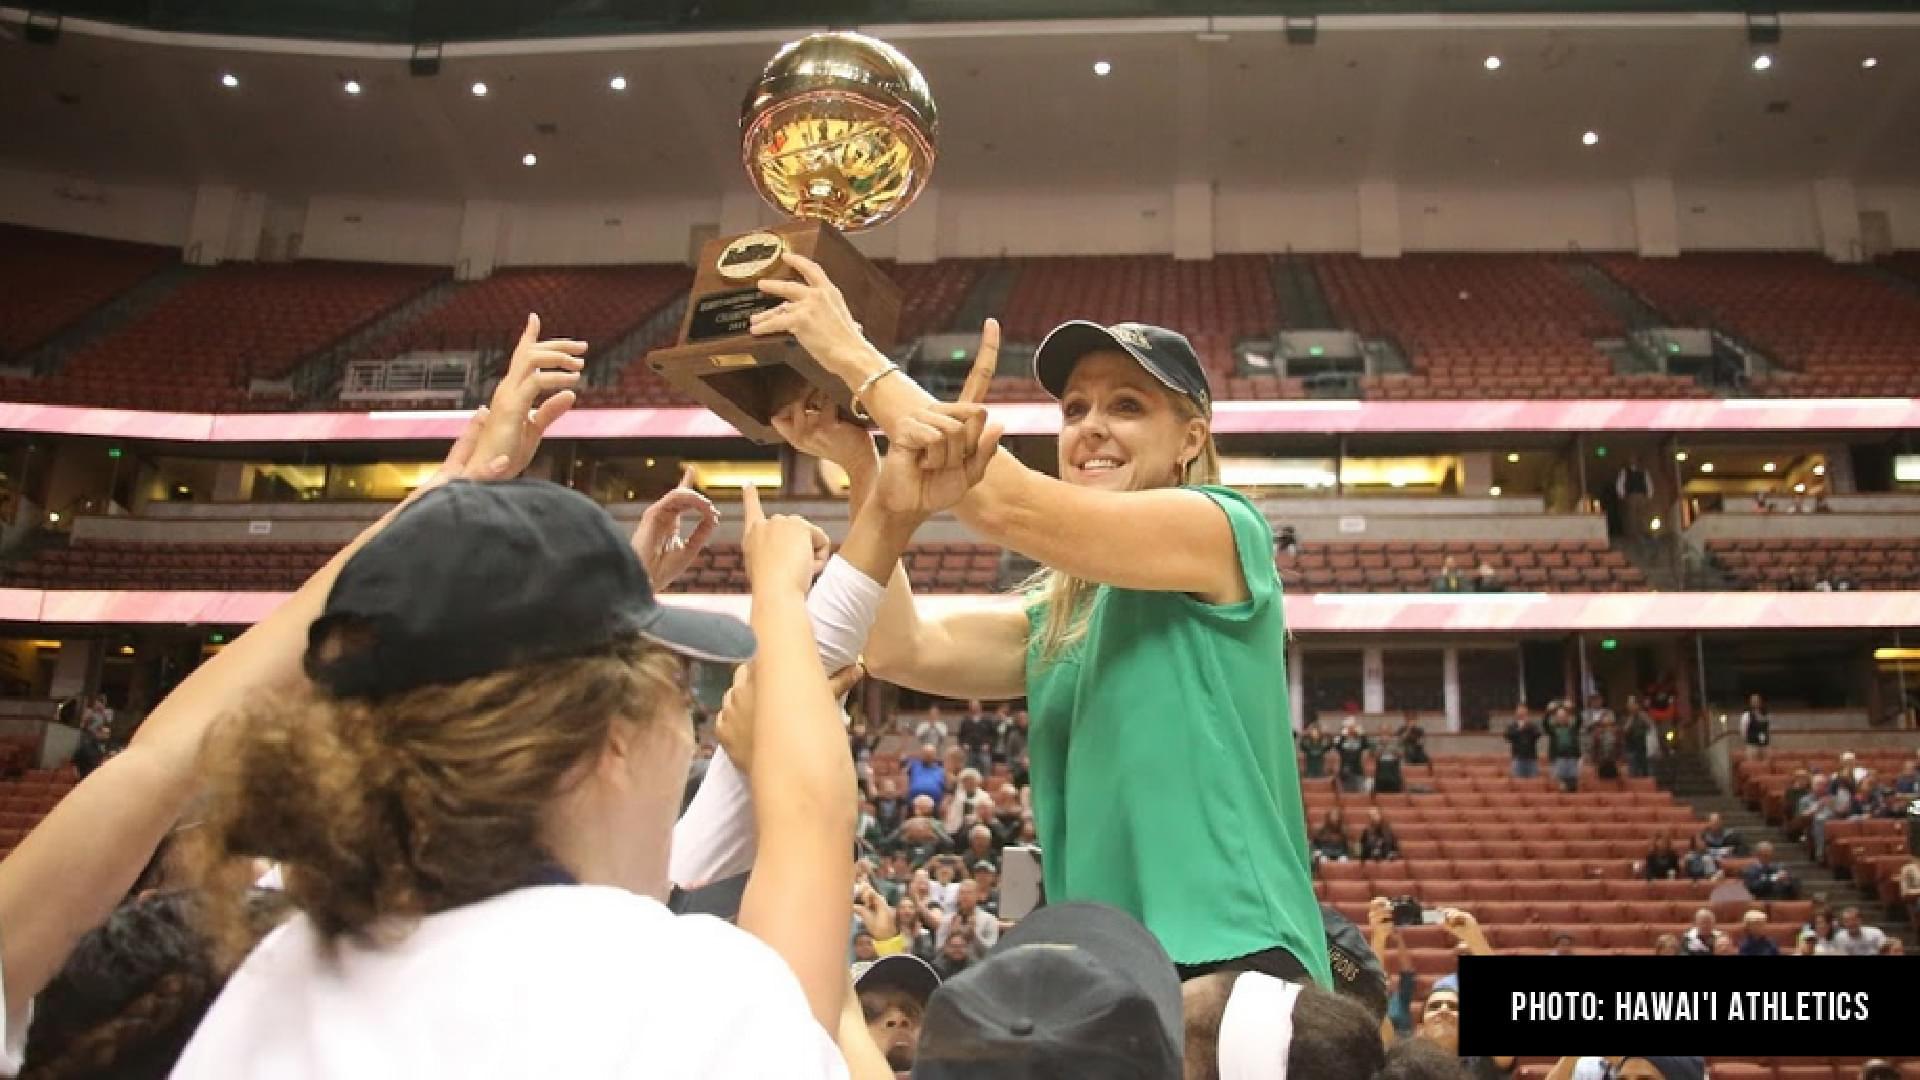 Coach's Profile: Laura Beeman